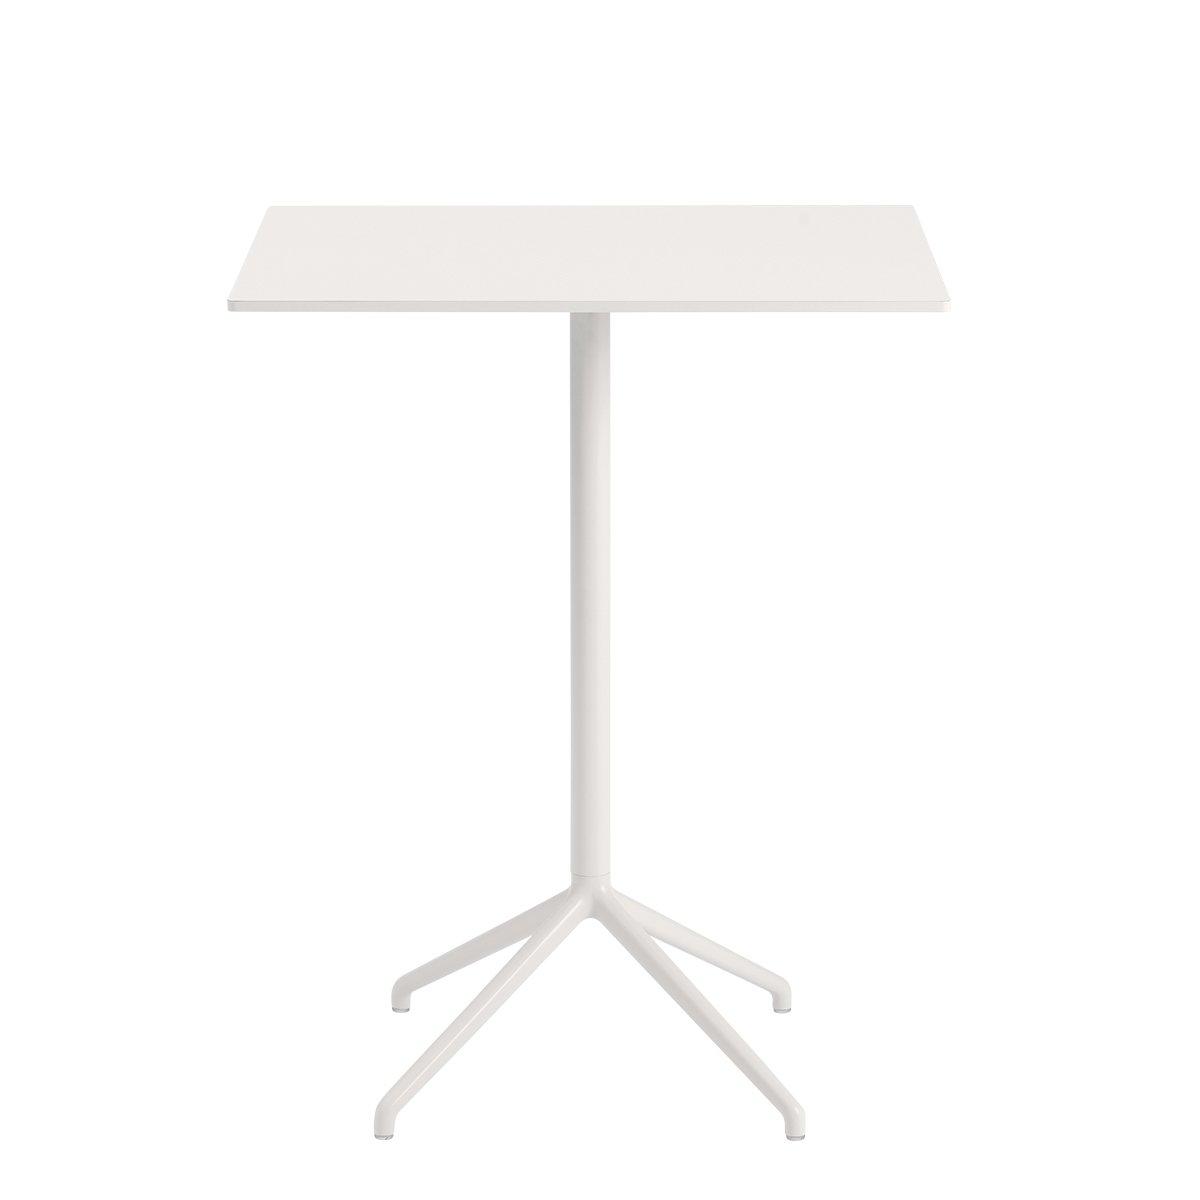 Muuto Still Caf� Tafel Rechthoekig Wit - Wit - Hoogte: 95 cm.